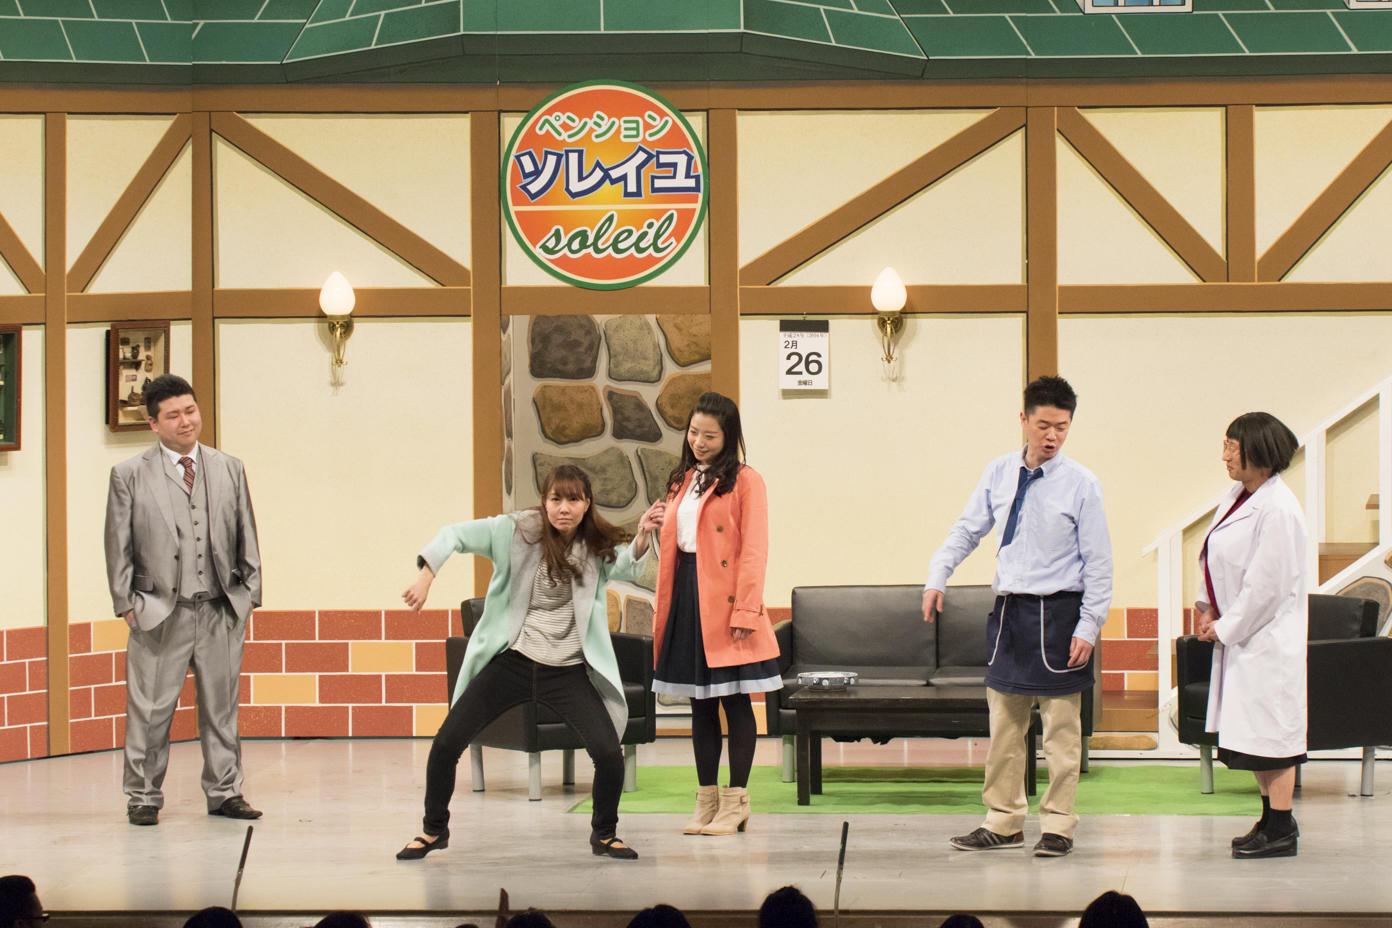 http://news.yoshimoto.co.jp/20160228174906-f0bd65dc7997a03aff731e0803047727d064535e.jpg